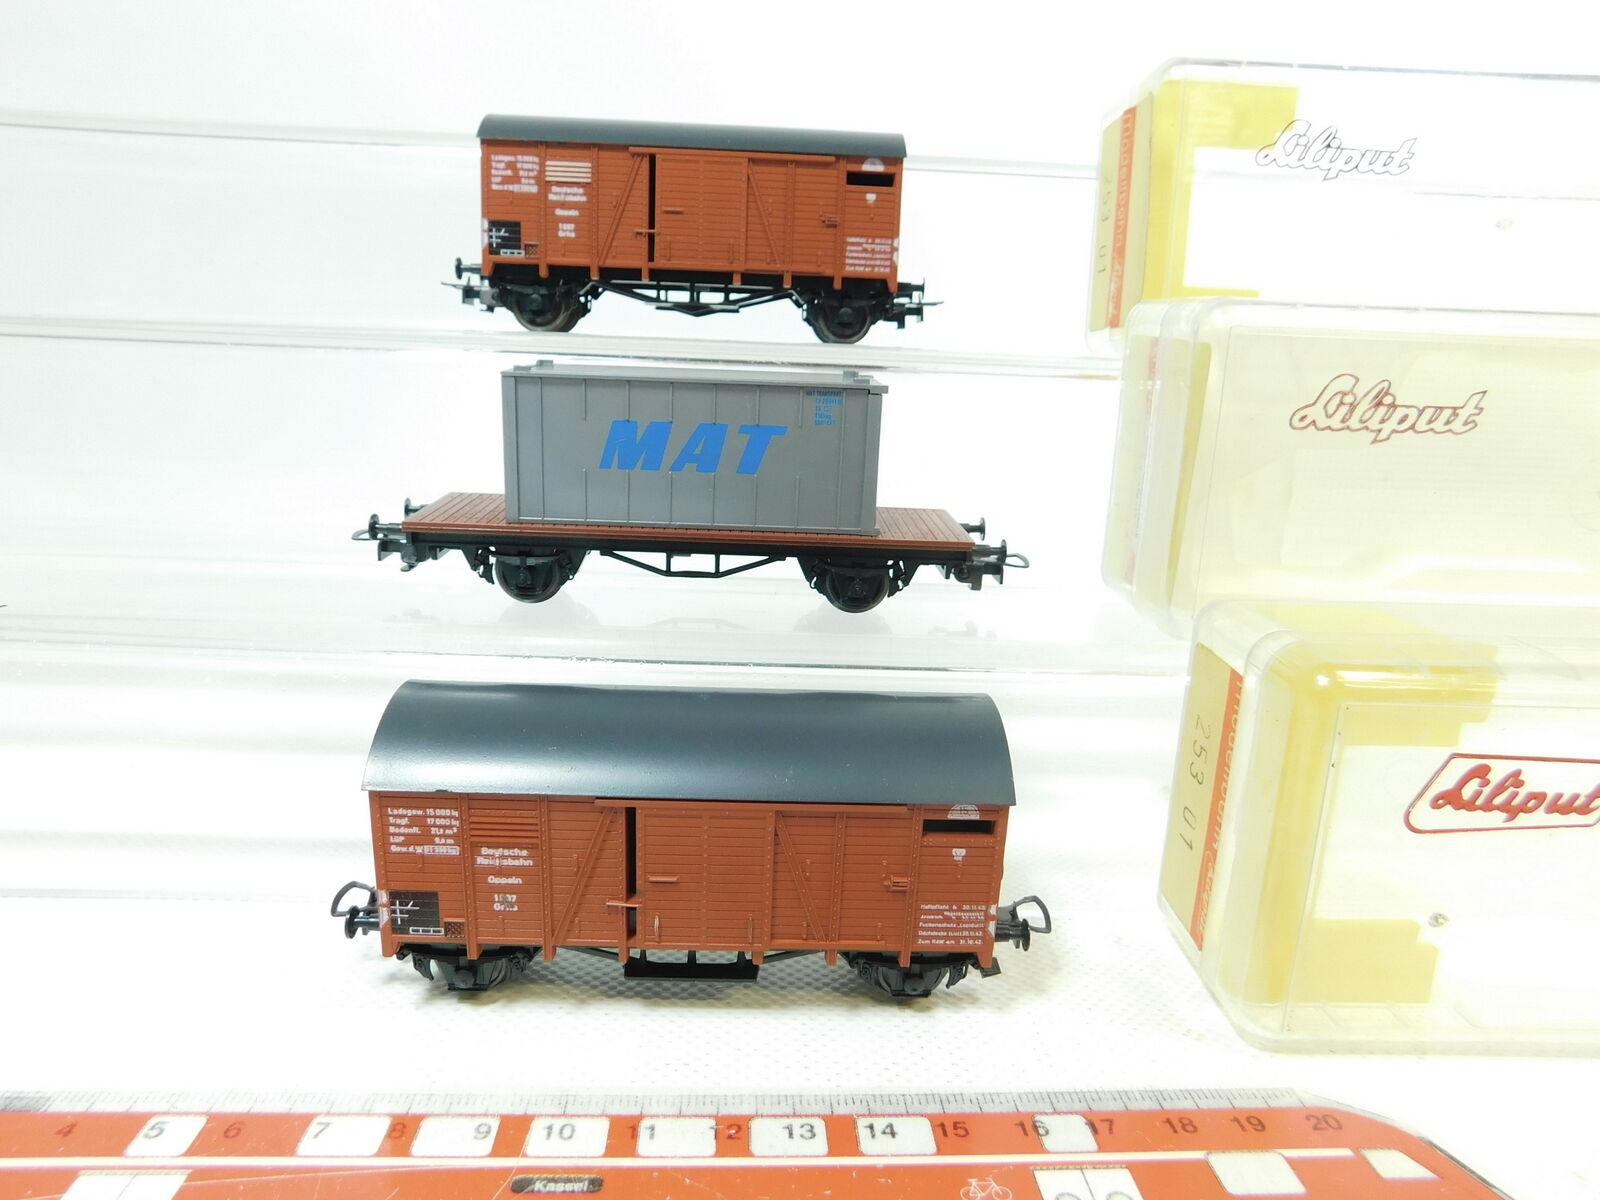 Bj140-1  3x Liliput h0 dc CARRO MERCI DRG  20311 MAT + 25301, molto bene + OVP